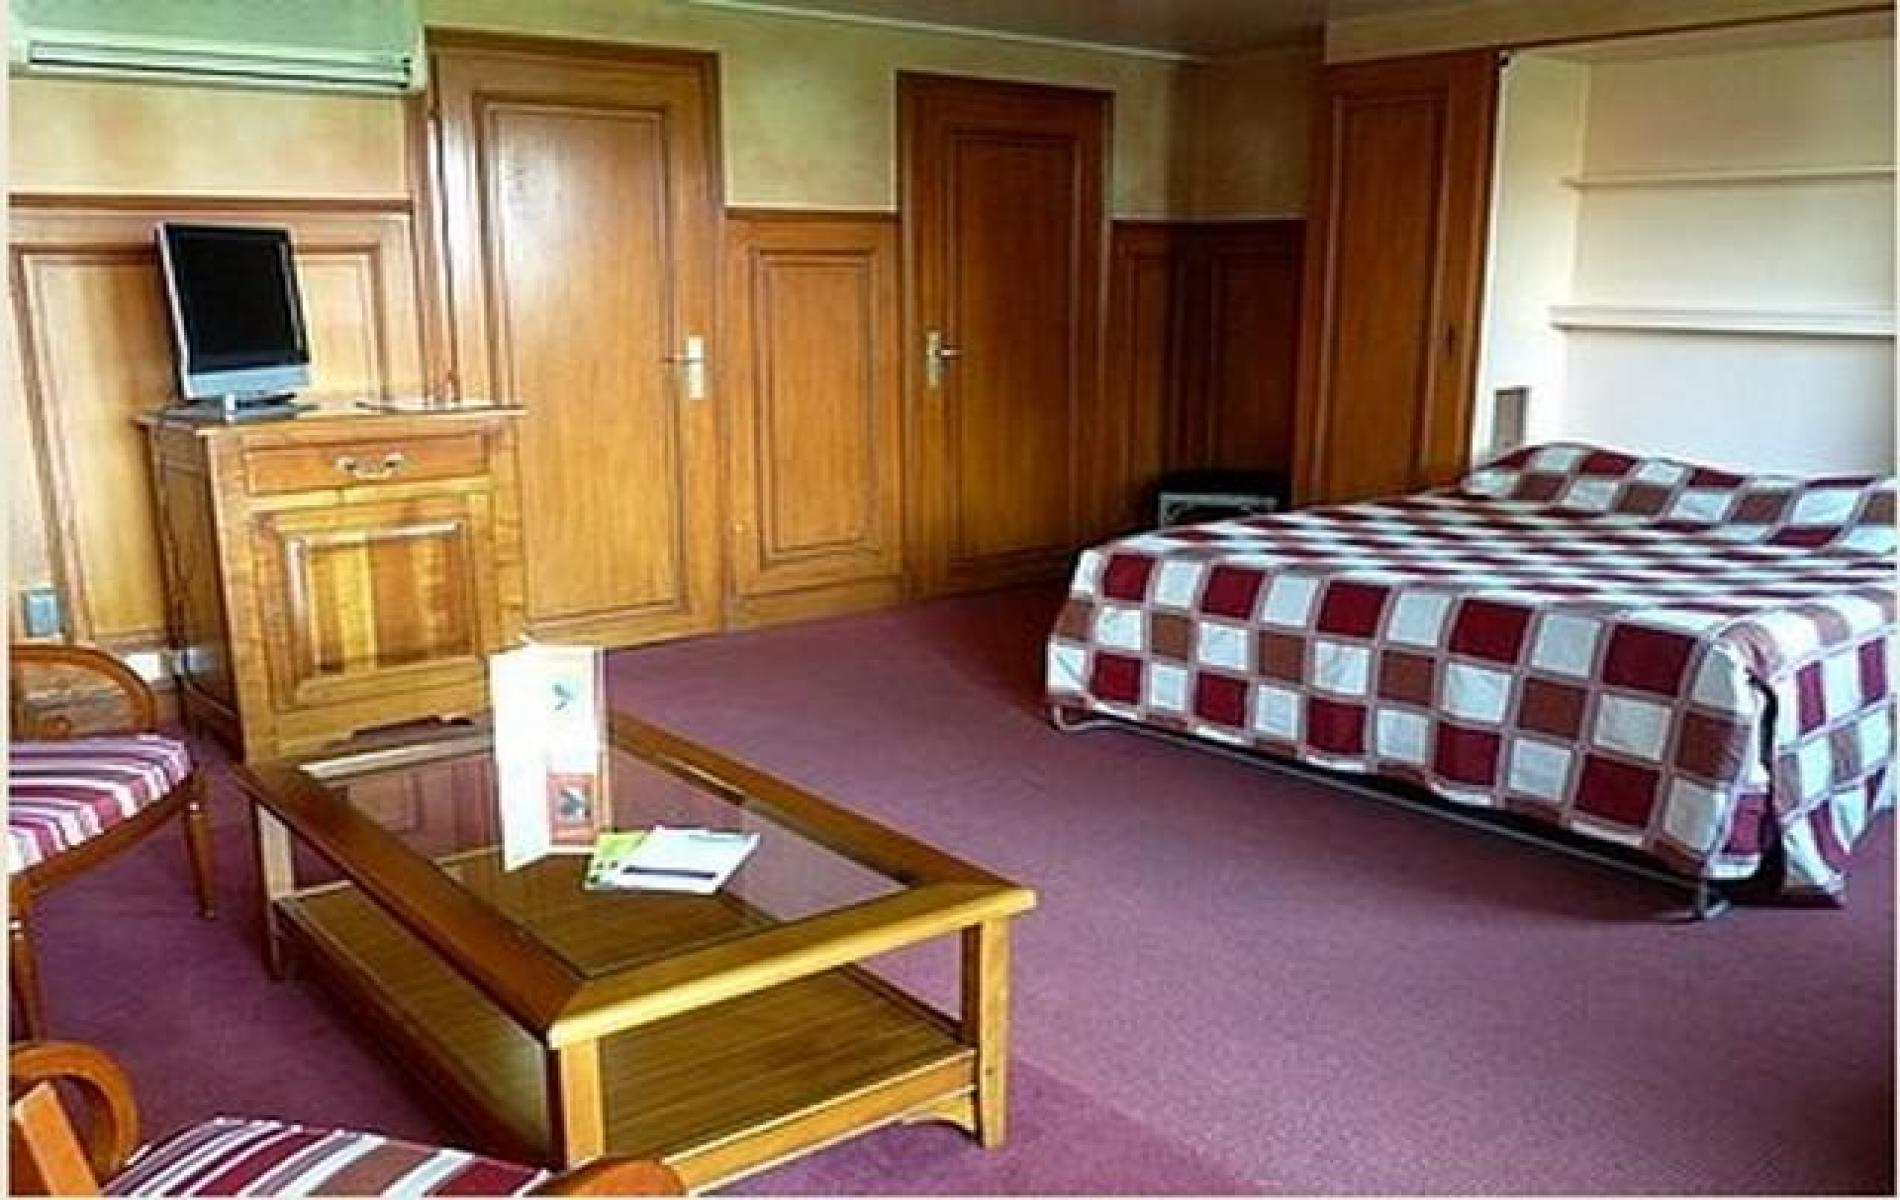 Chambre familiale extra large offres speciales hotel for Chambre de commerce villefranche sur saone